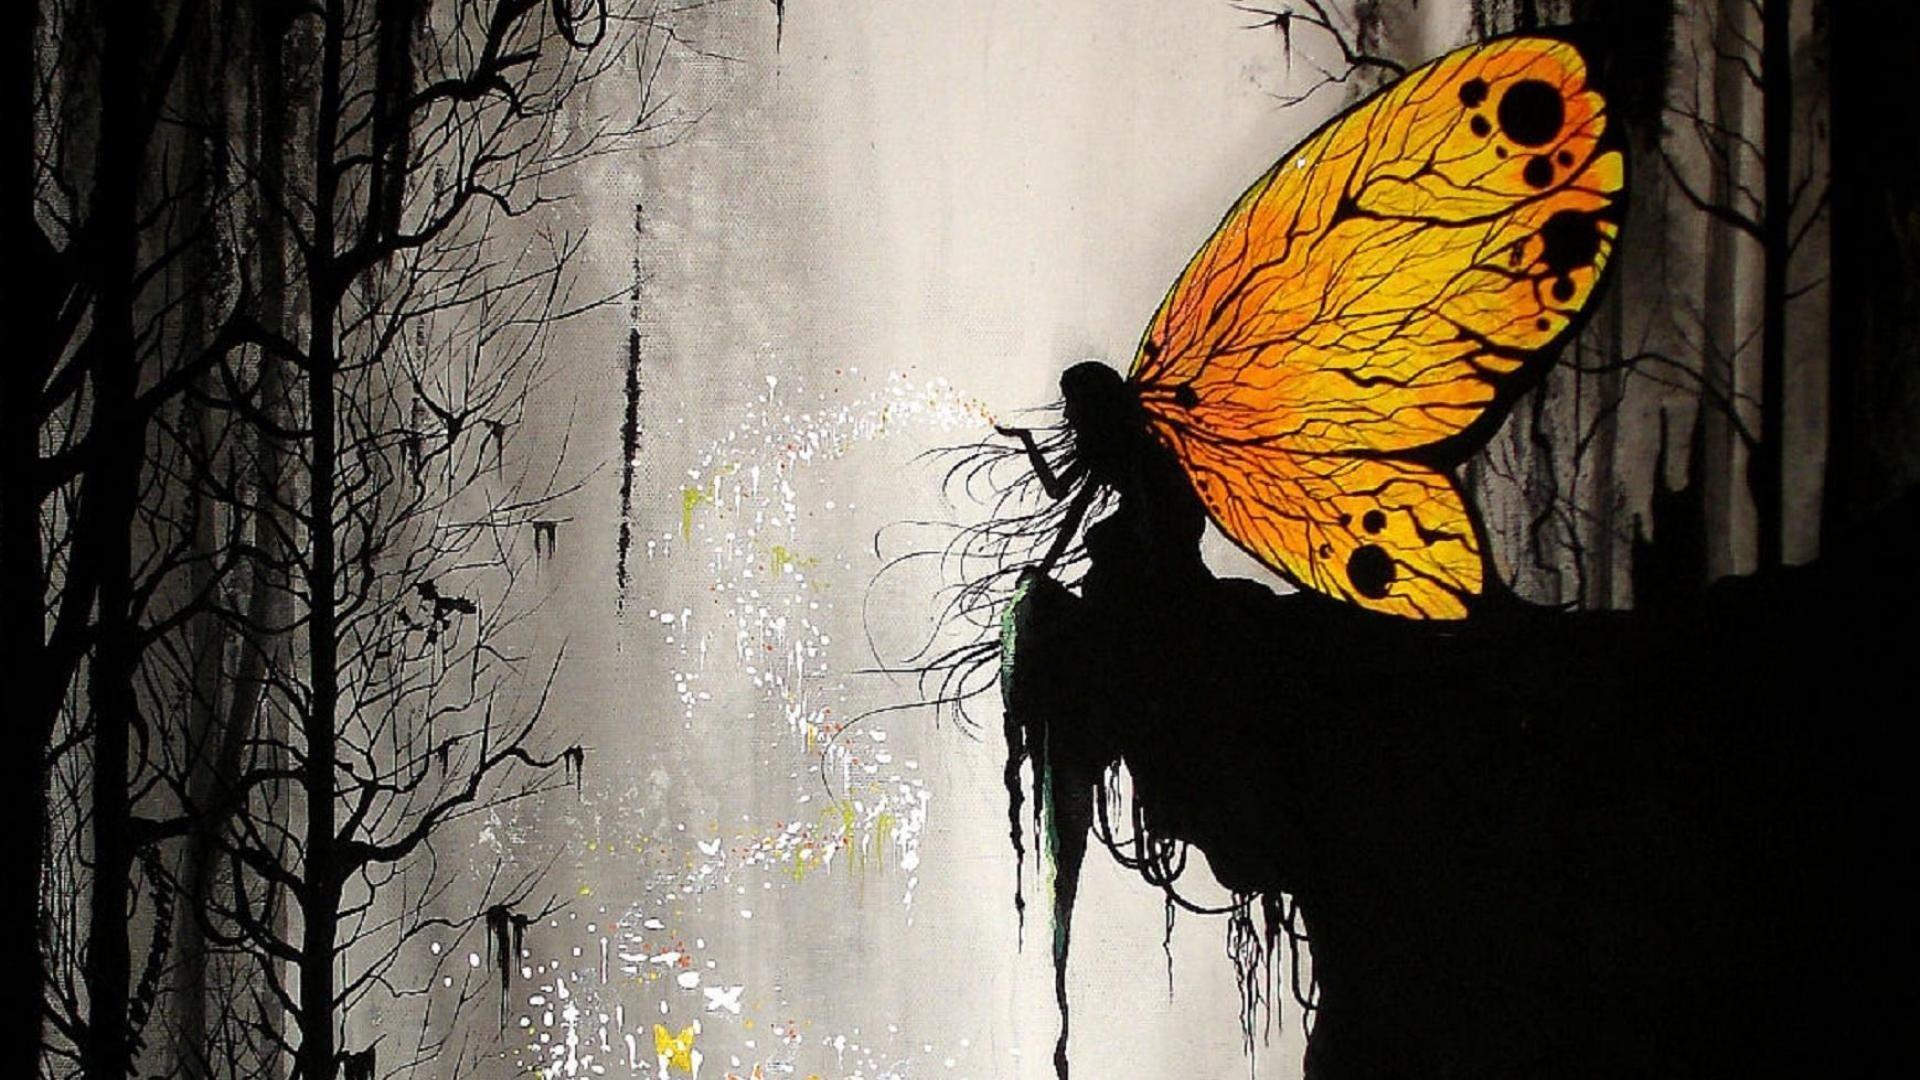 Butterfly Fantasy Girl HD Wallpaper Hintergrund 1920x1080 ID702010 Wallpaper Abyss